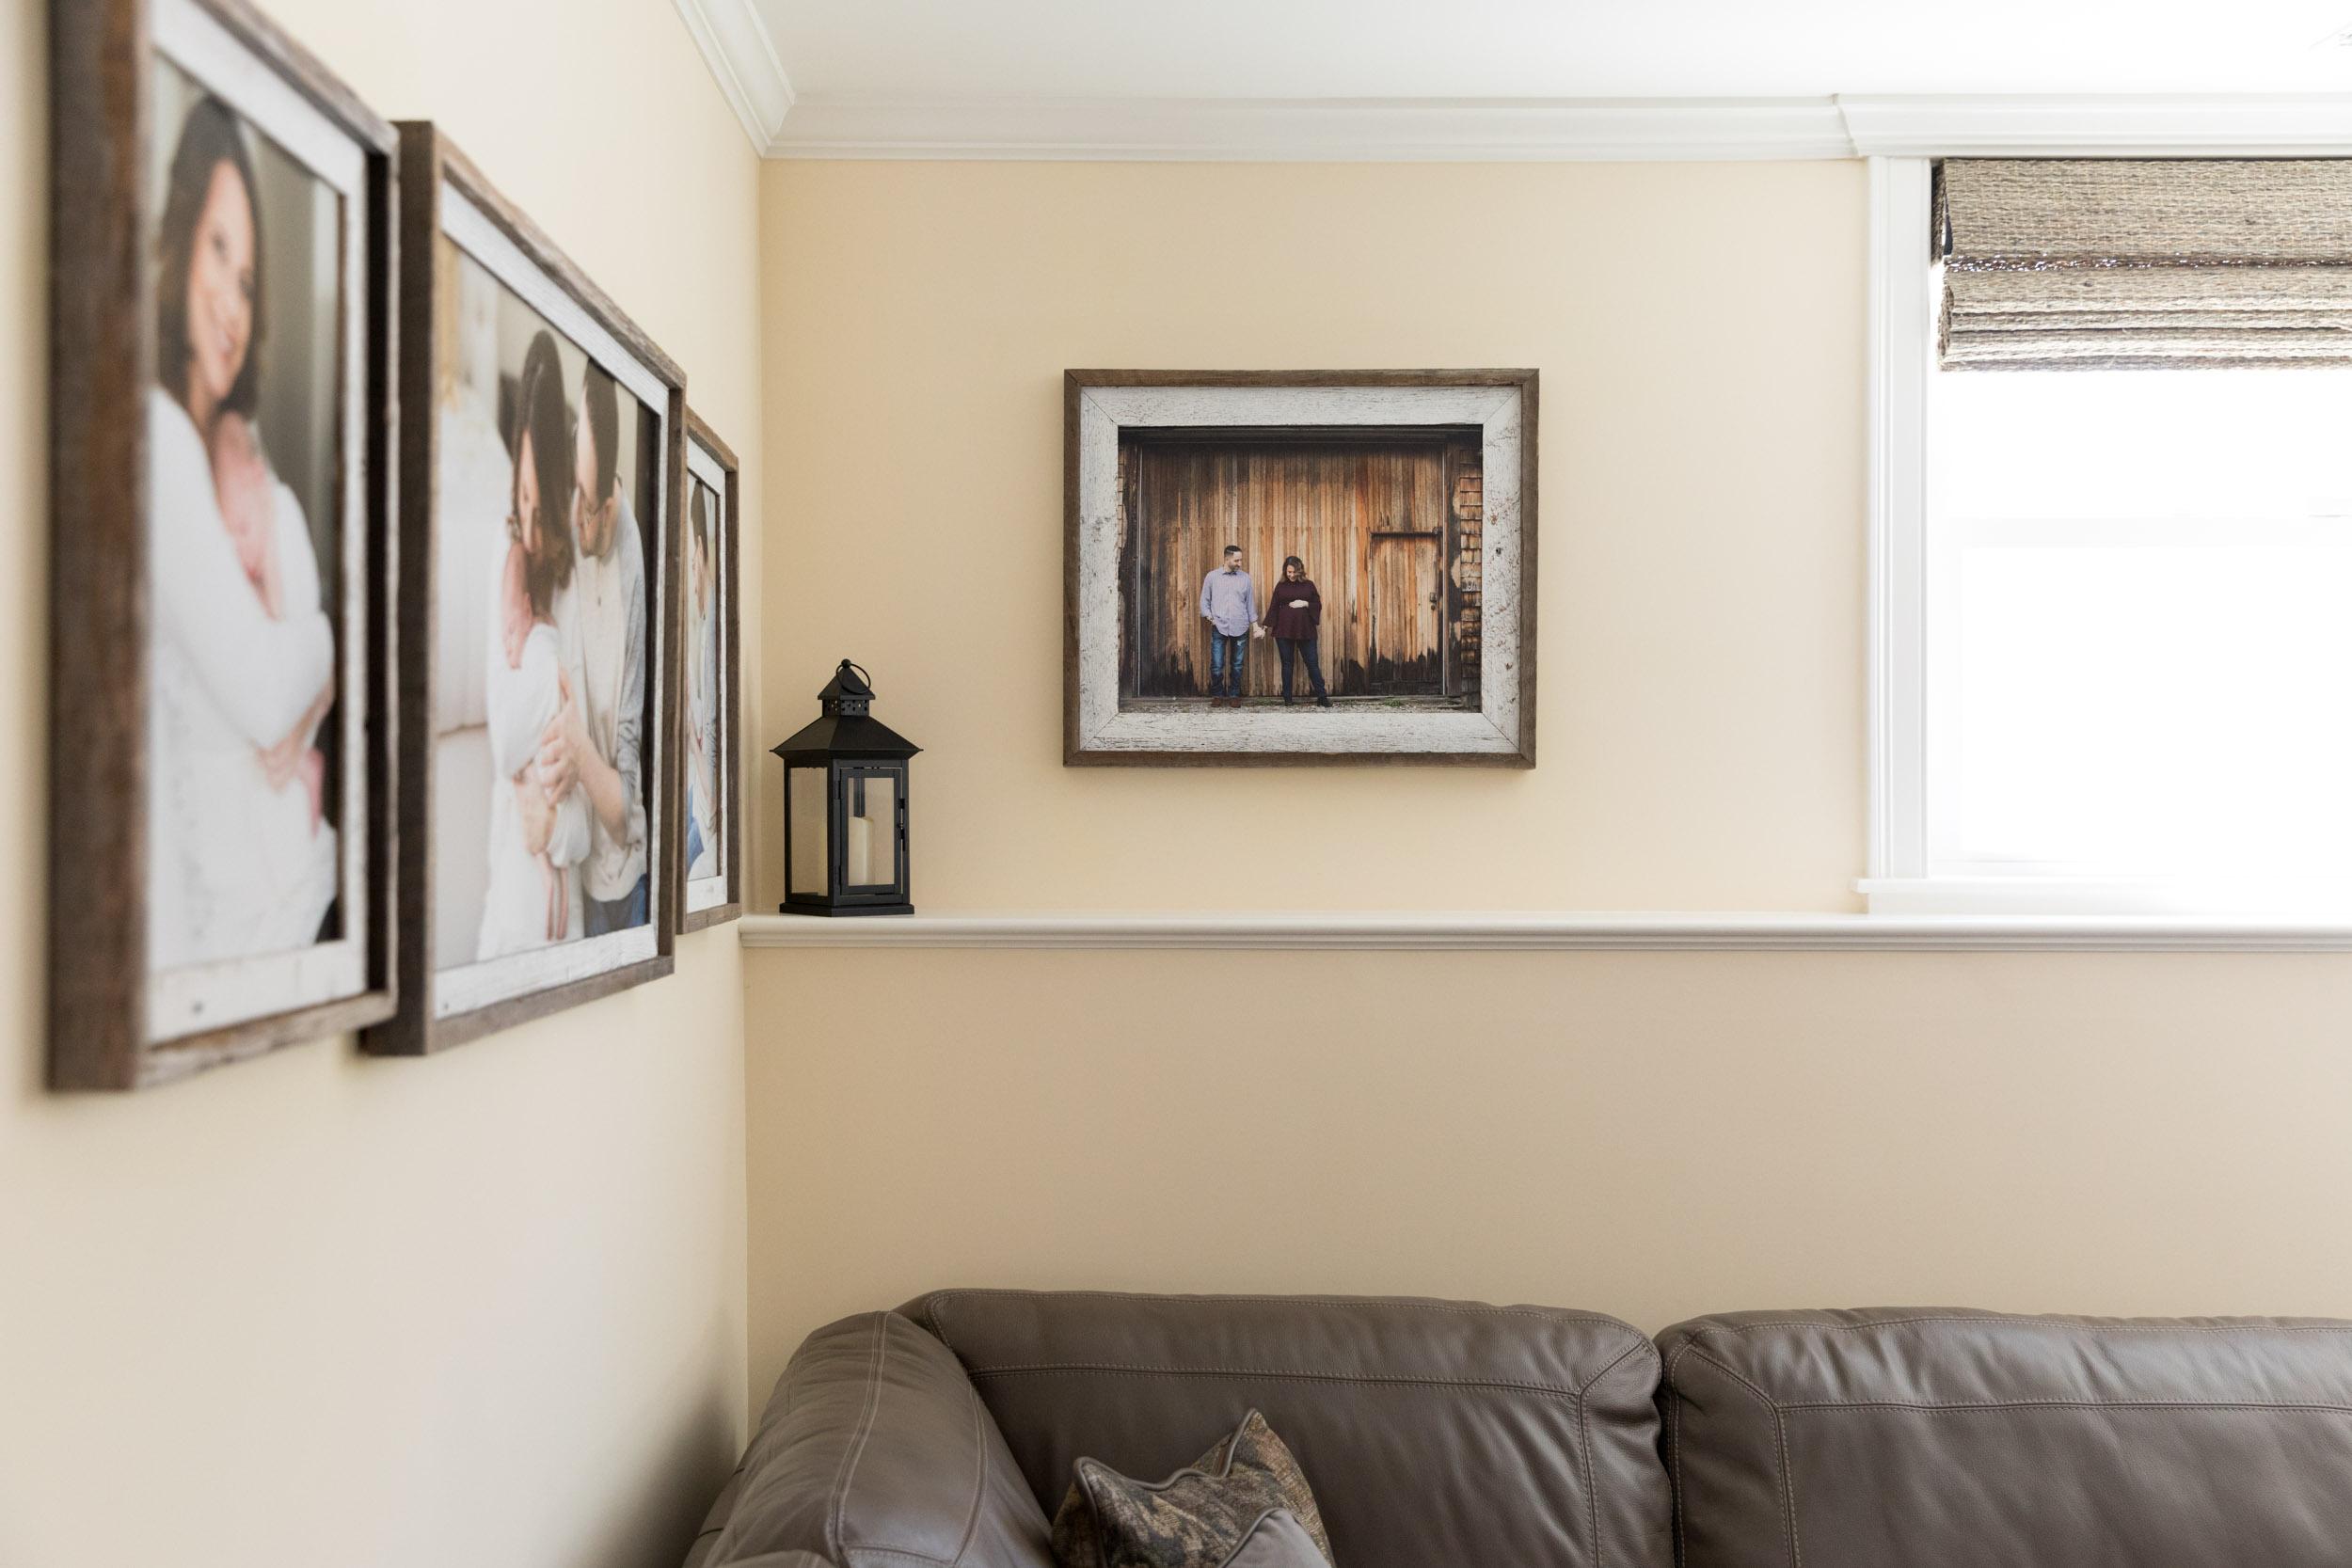 gallery-walls-photographs-rustic.jpg